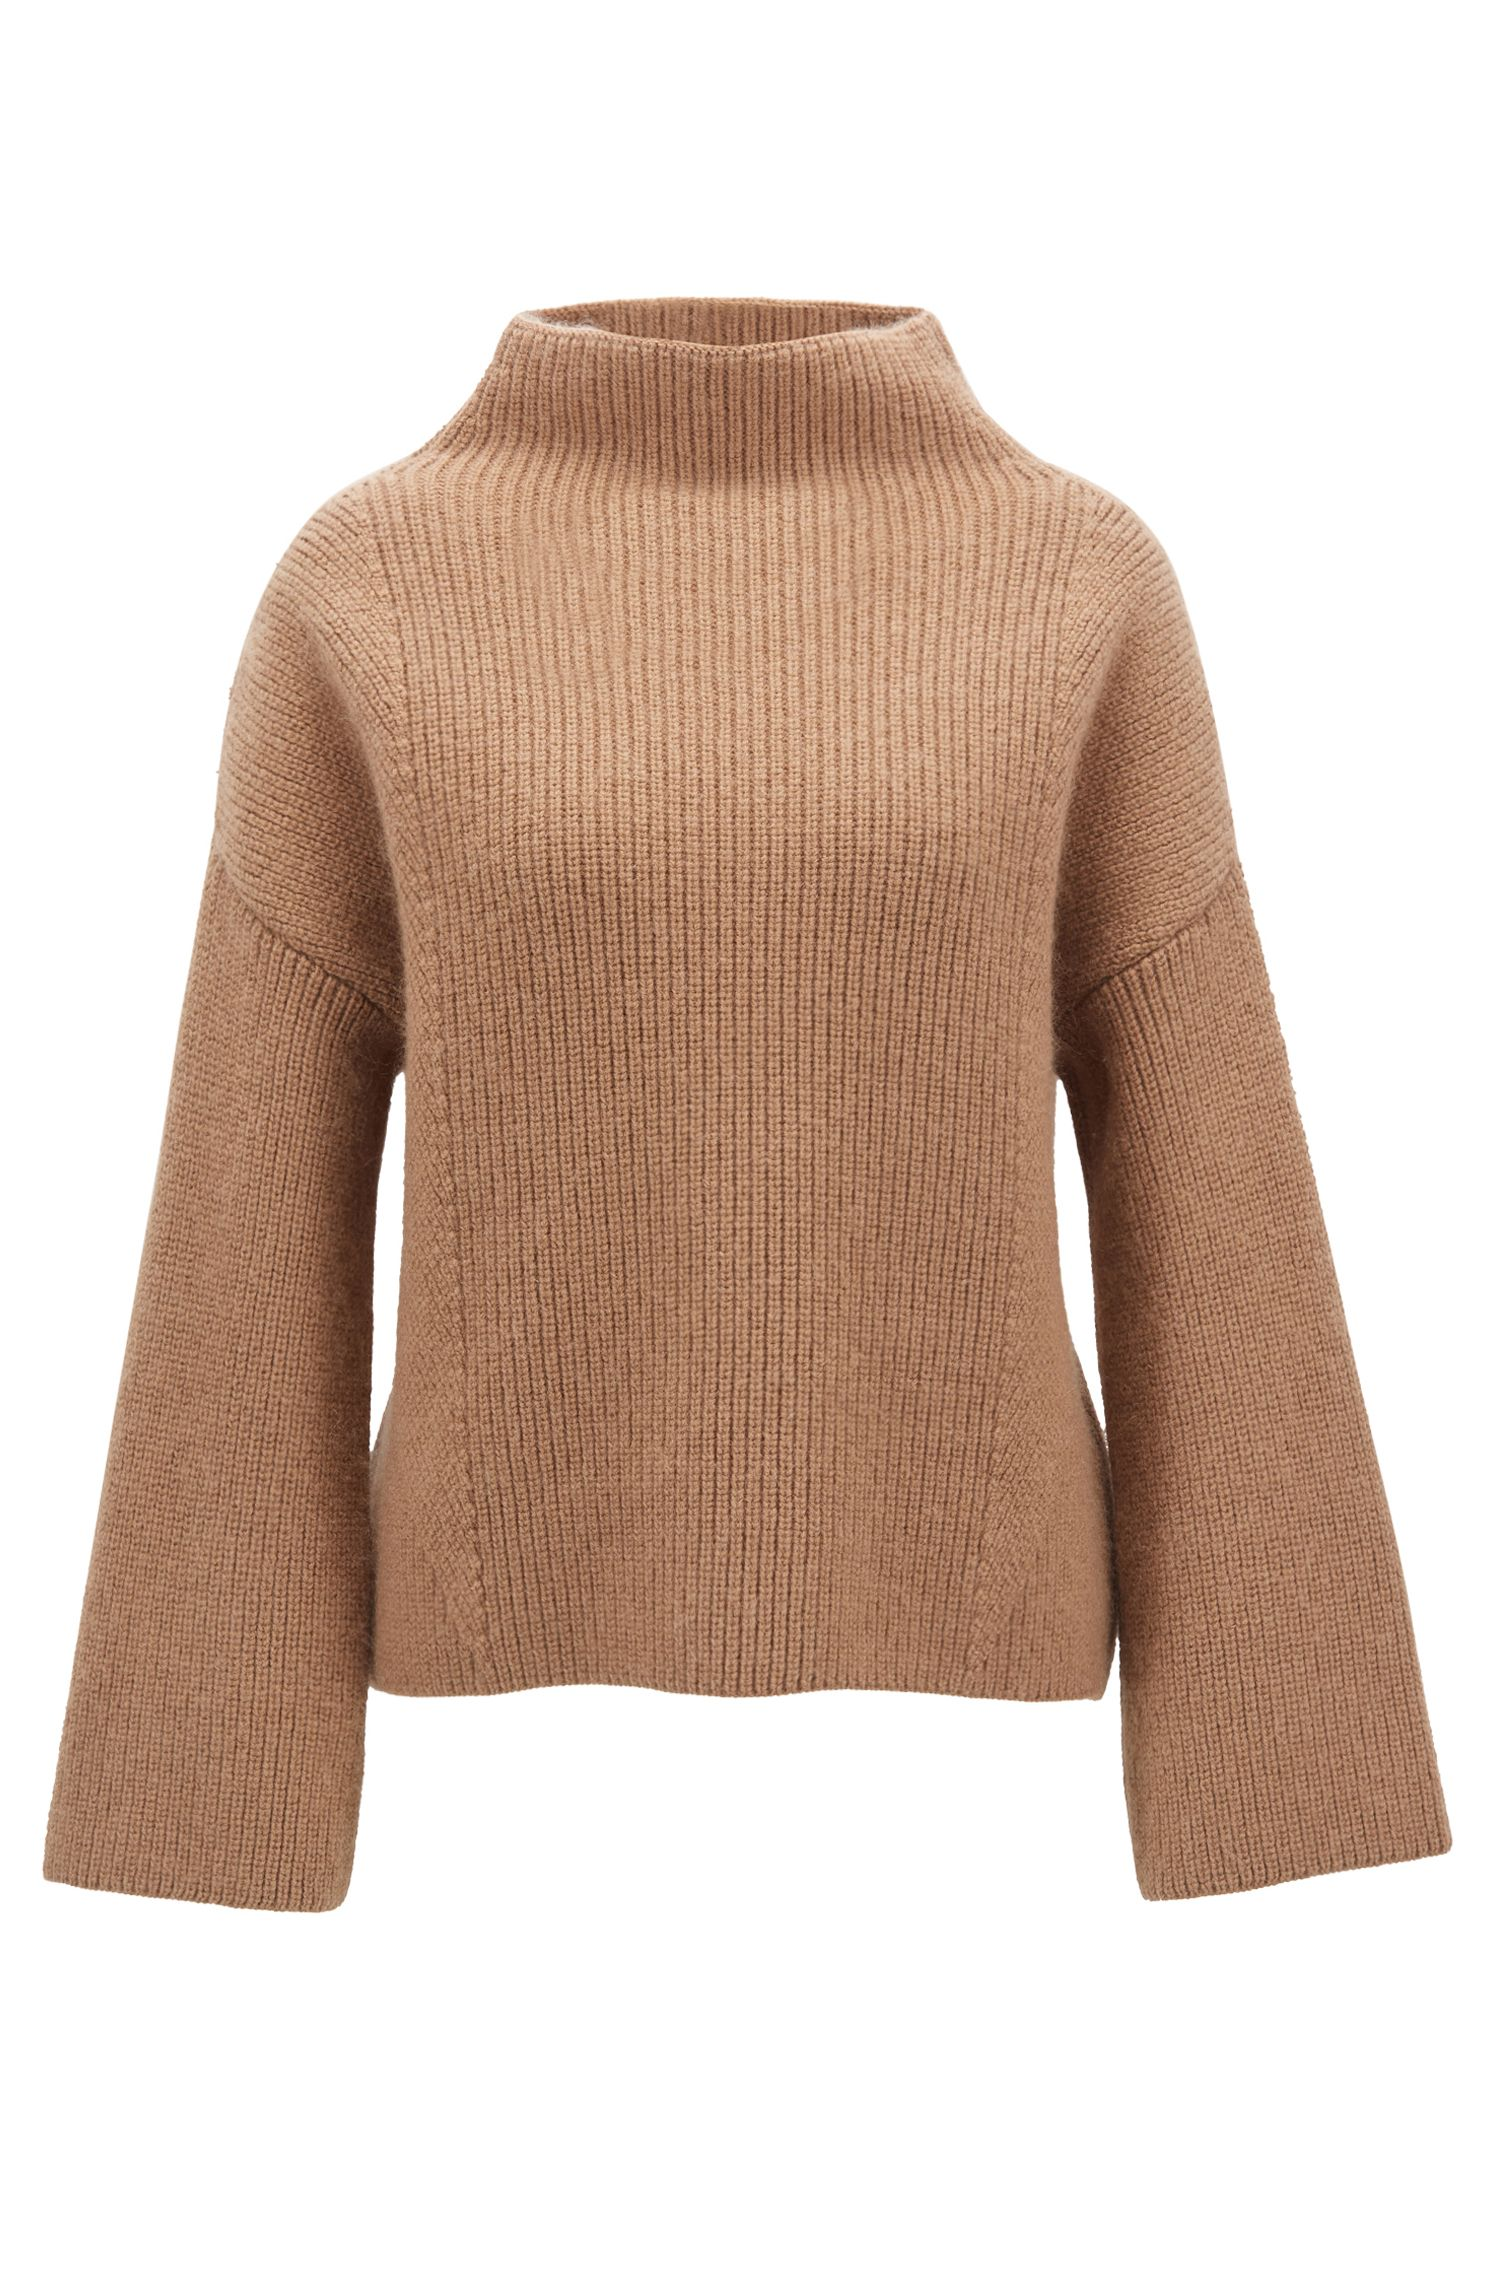 Stand-collar sweater in an Italian virgin-wool blend, Brown